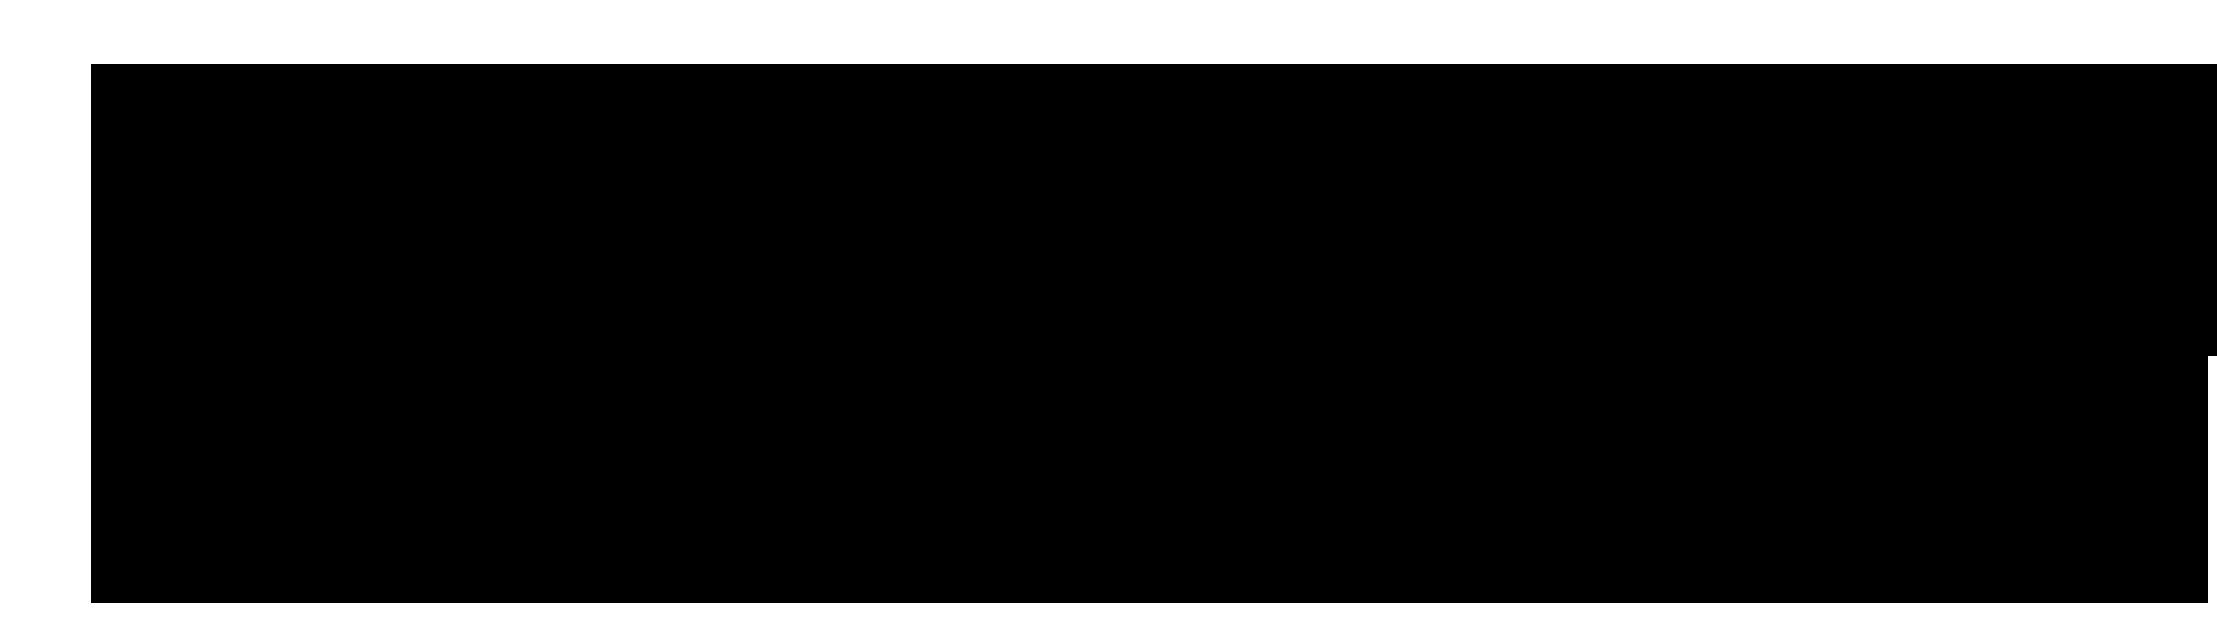 Himantha Perera